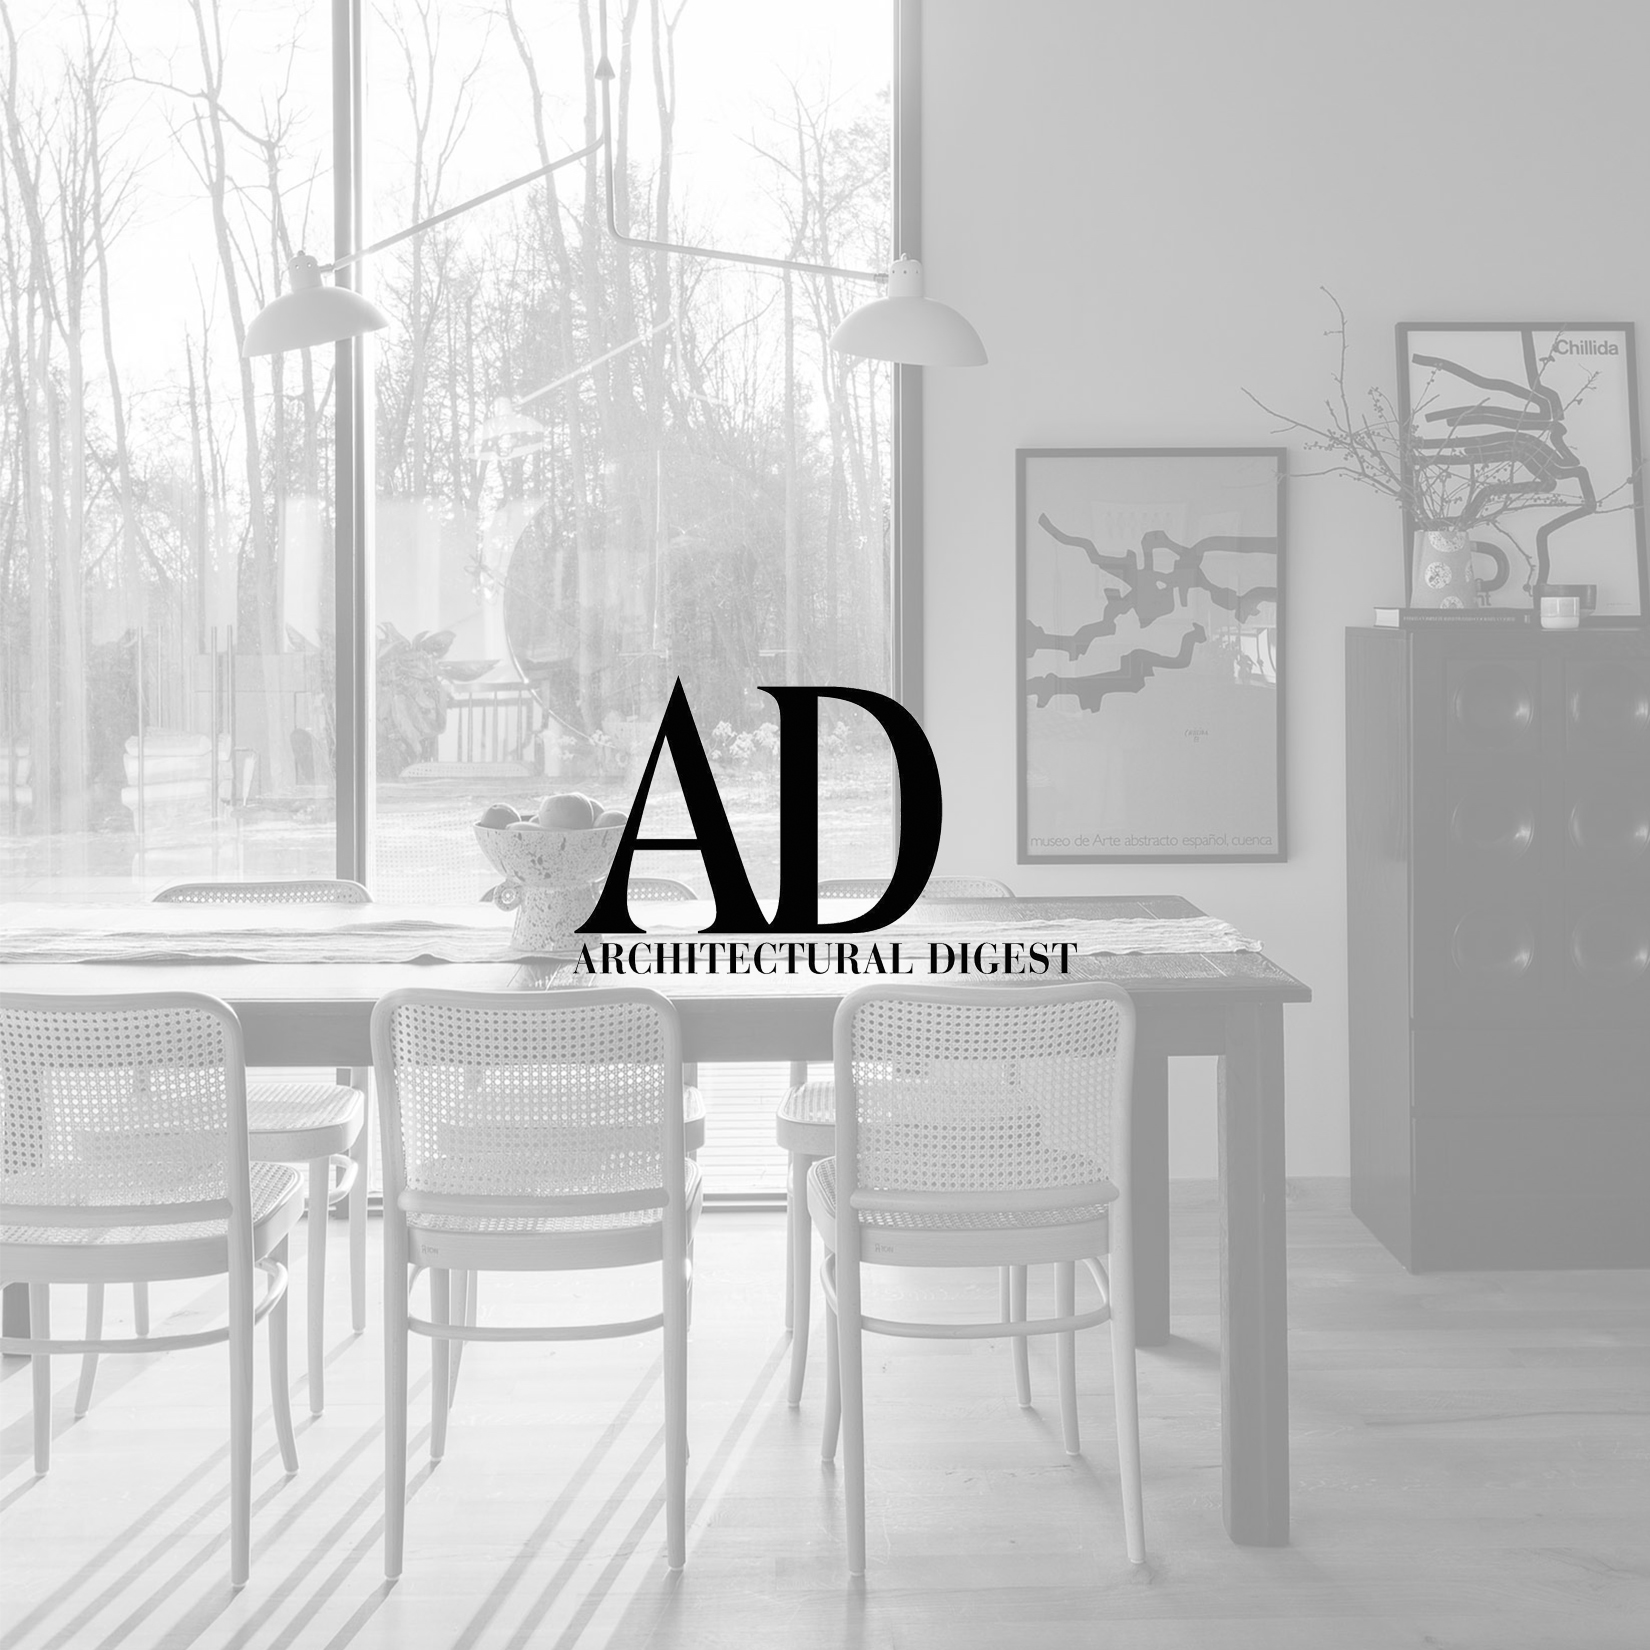 AD Spain Hudson Woods.jpg